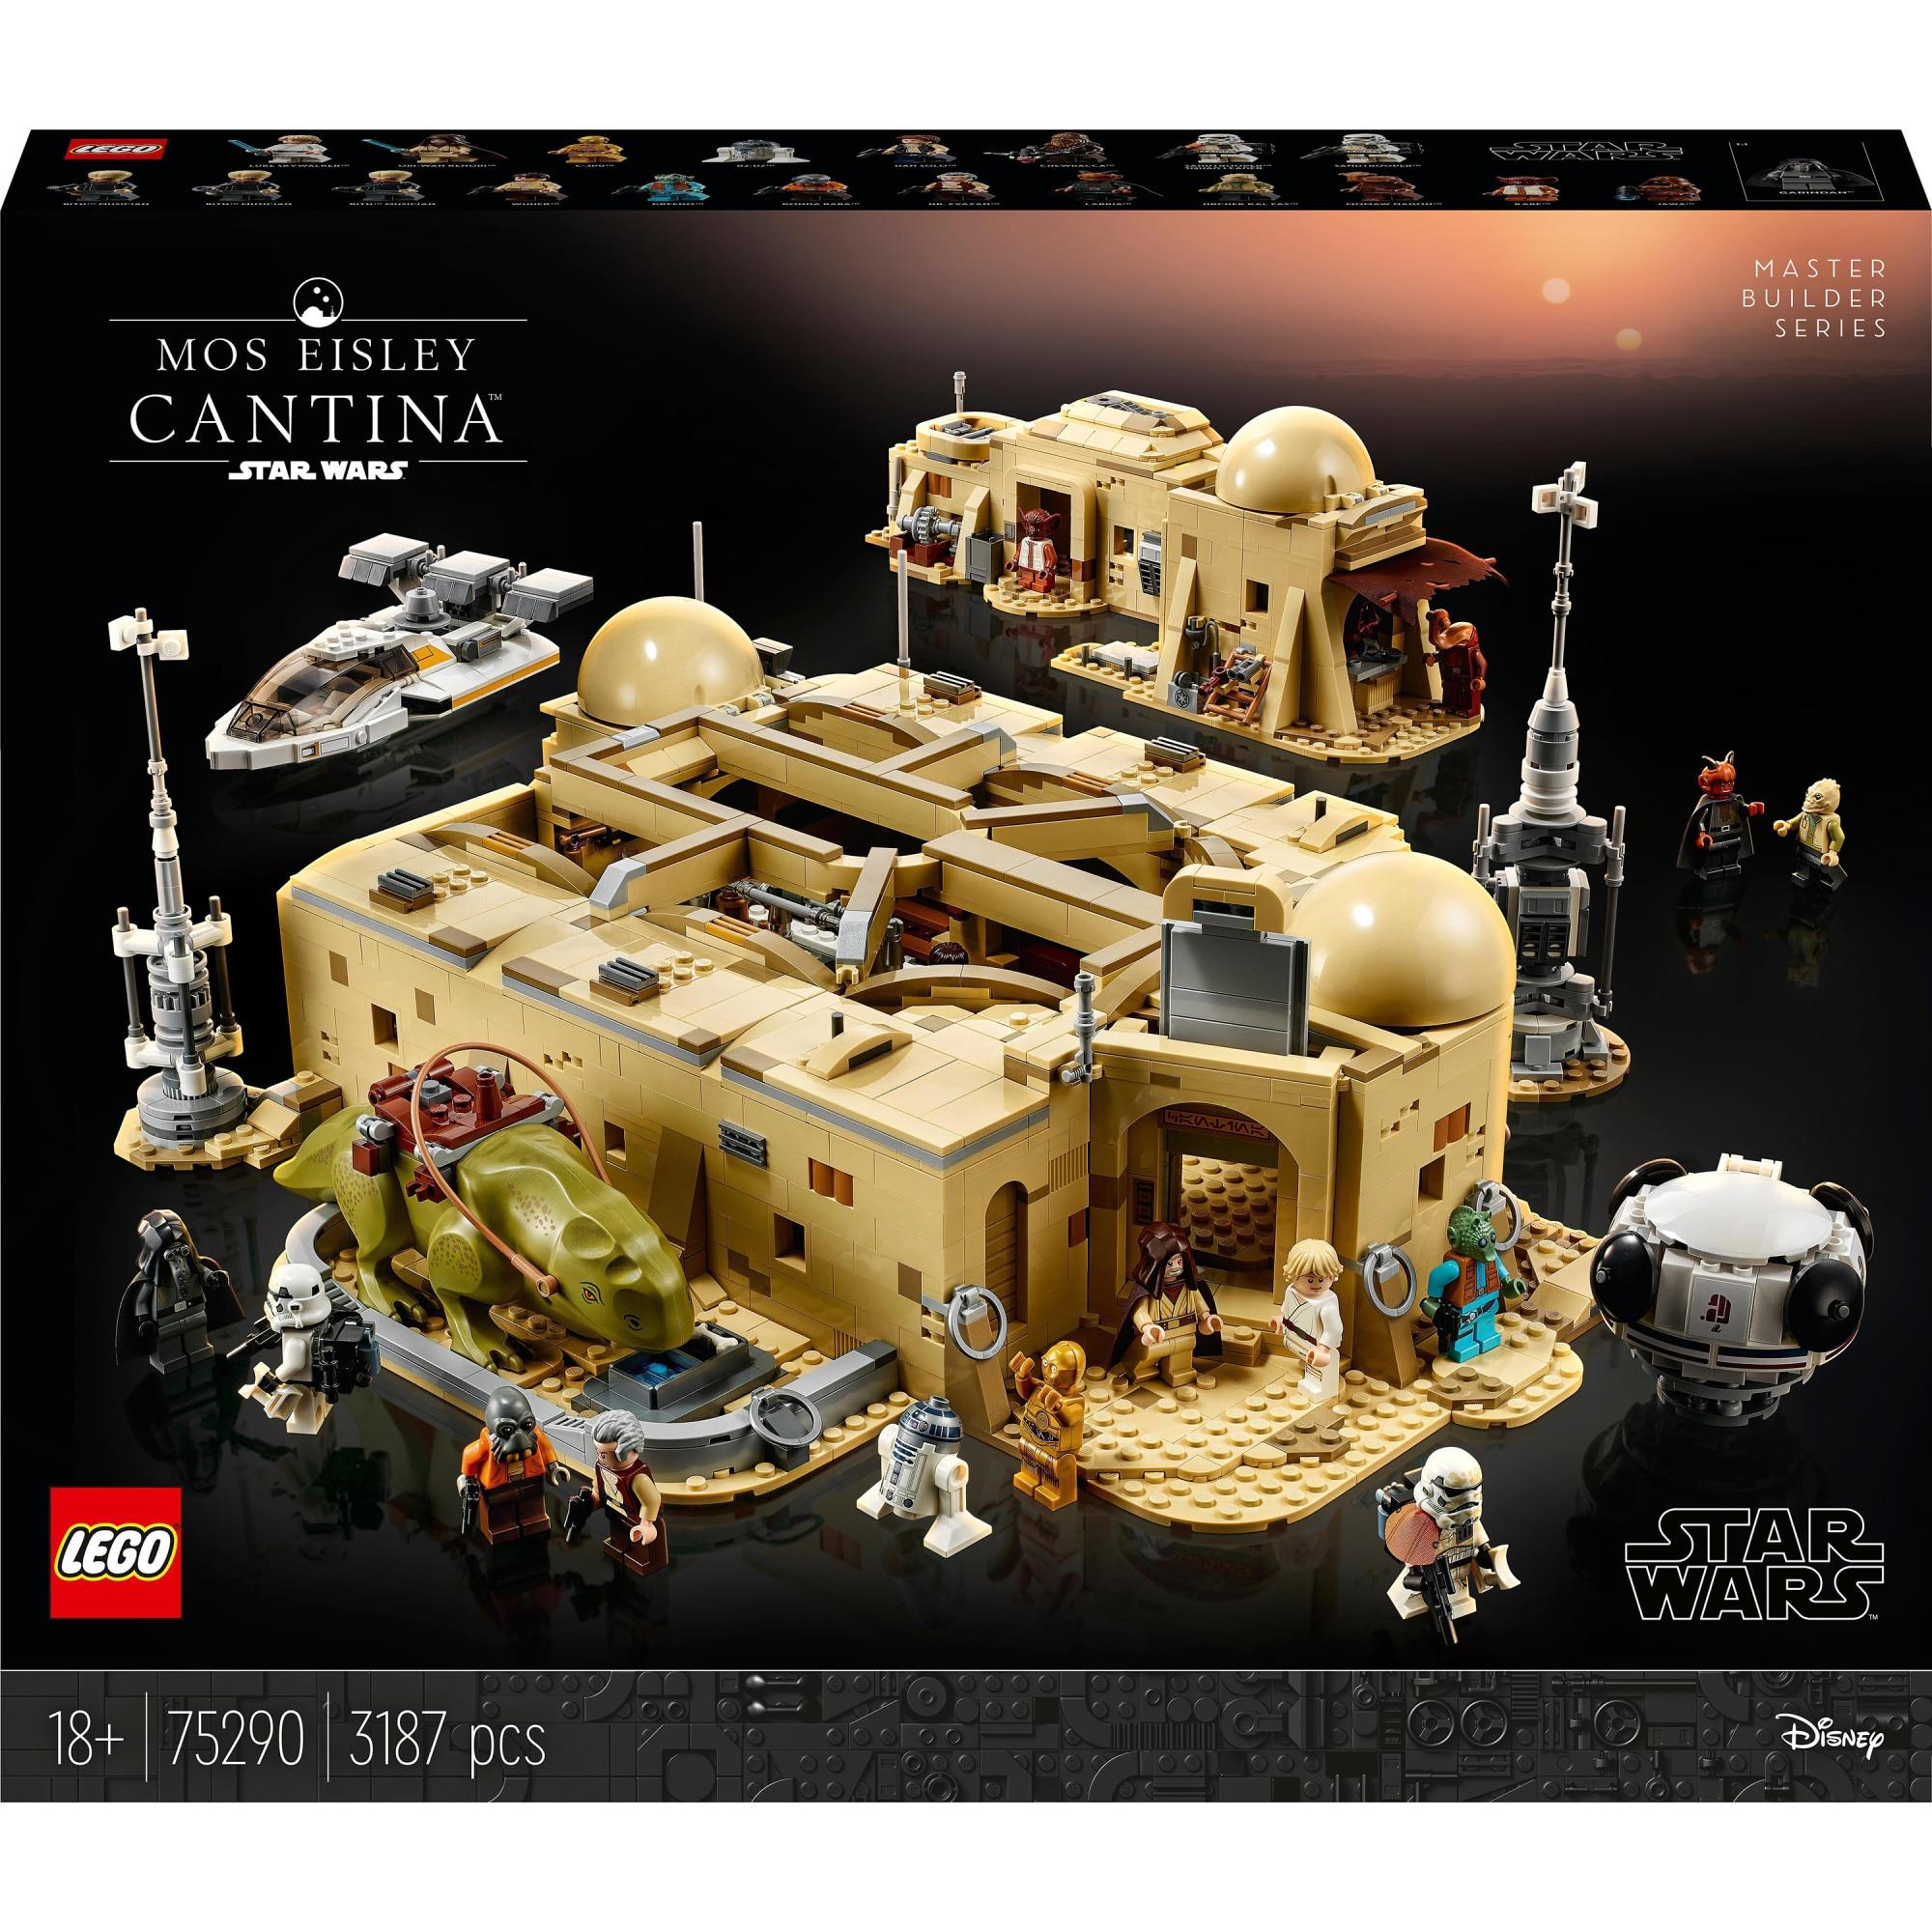 Fotografie LEGO Star Wars - Mos Eisley Cantina 75290, 3187 piese